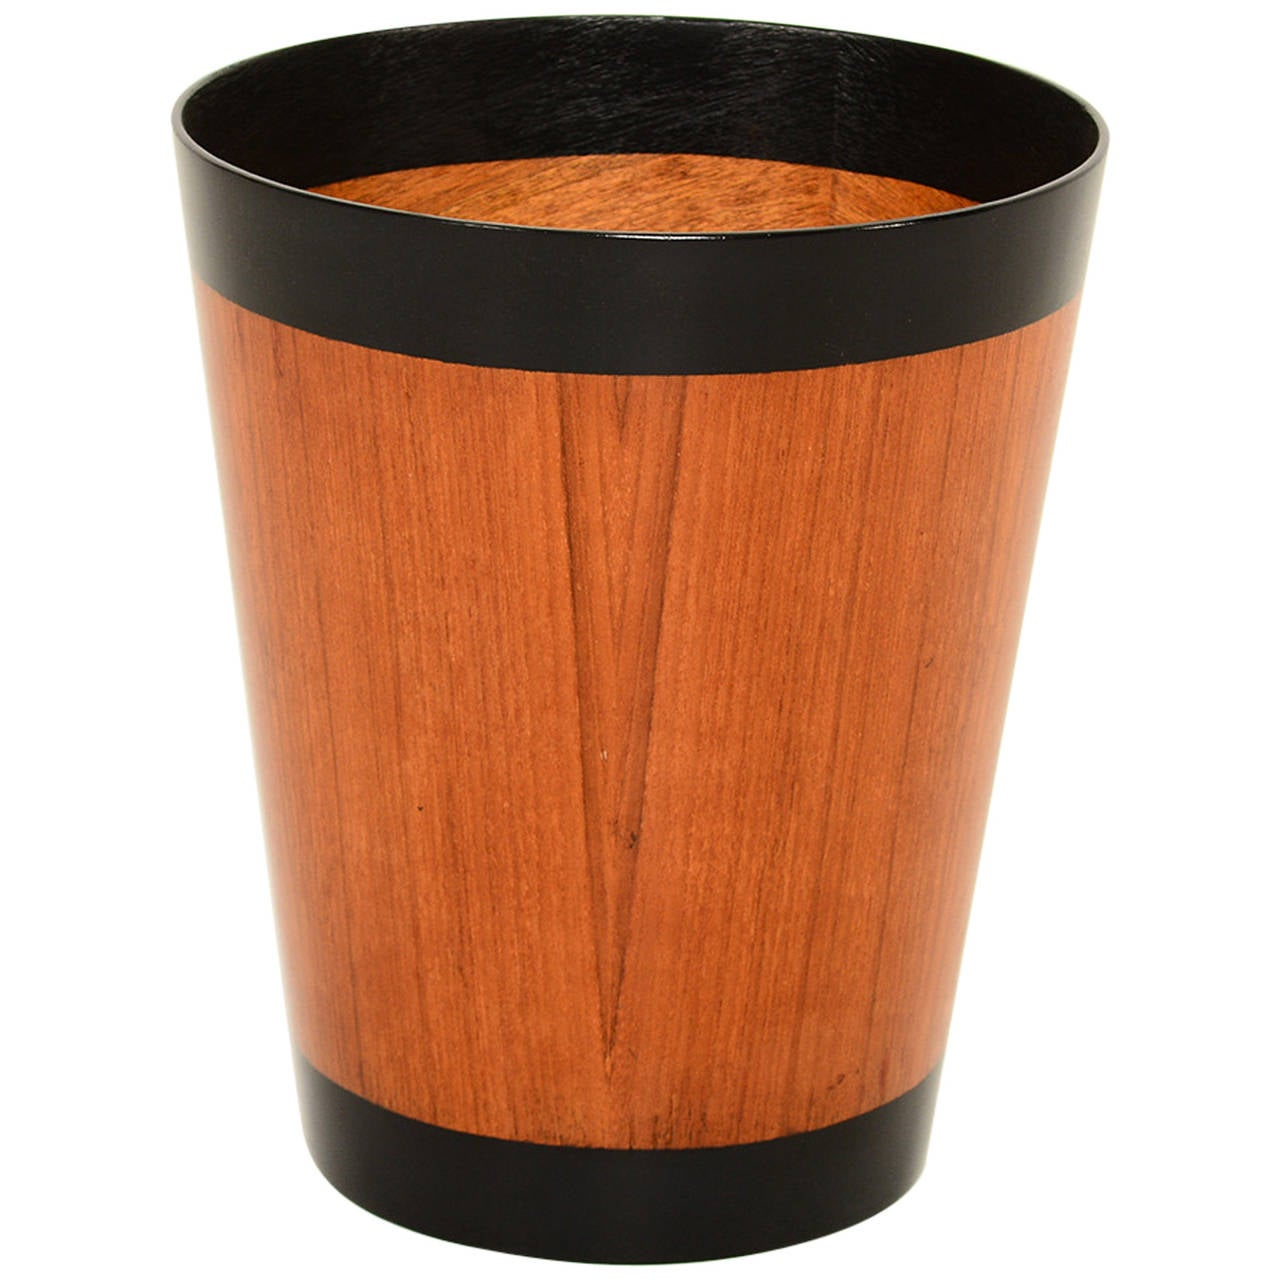 Danish Modern Teak Waste Basket At 1stdibs